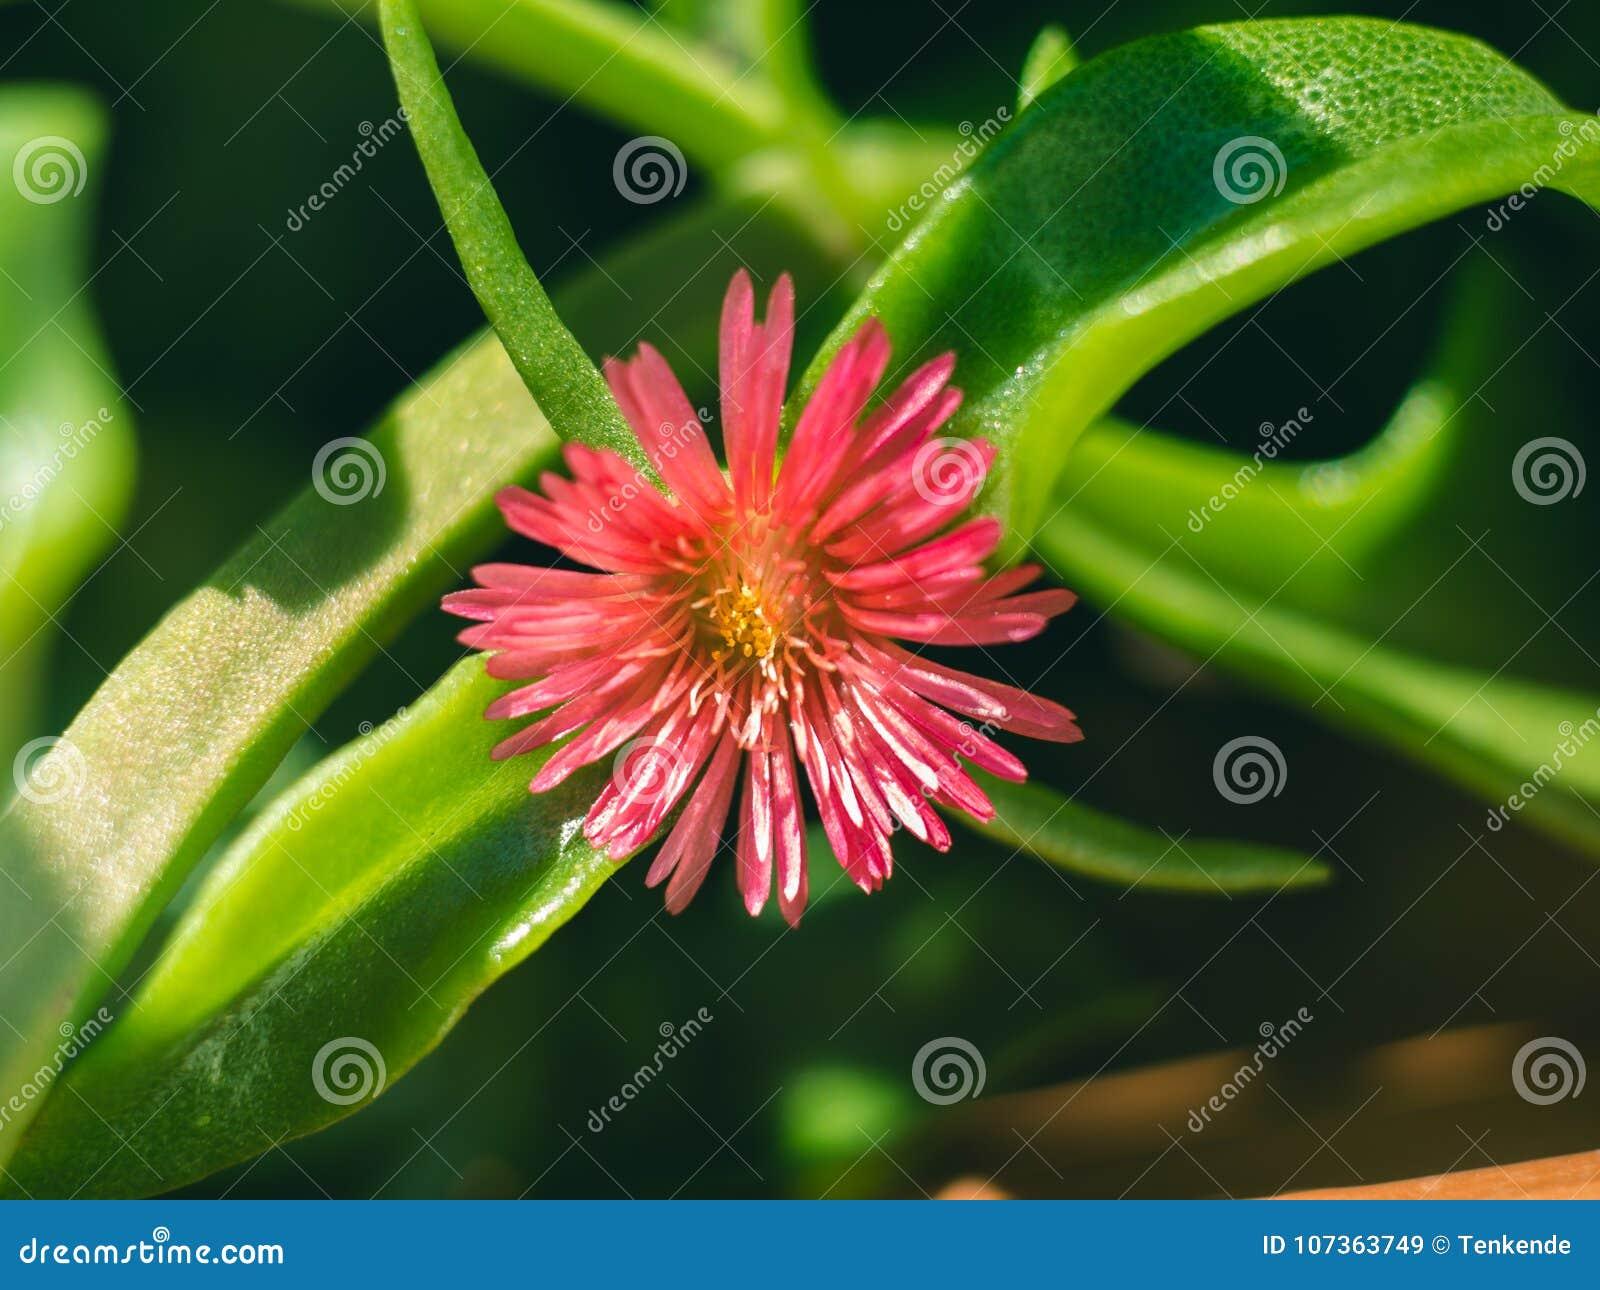 Succulent Plant Macro Shot Pink Flower Stock Image Image Of